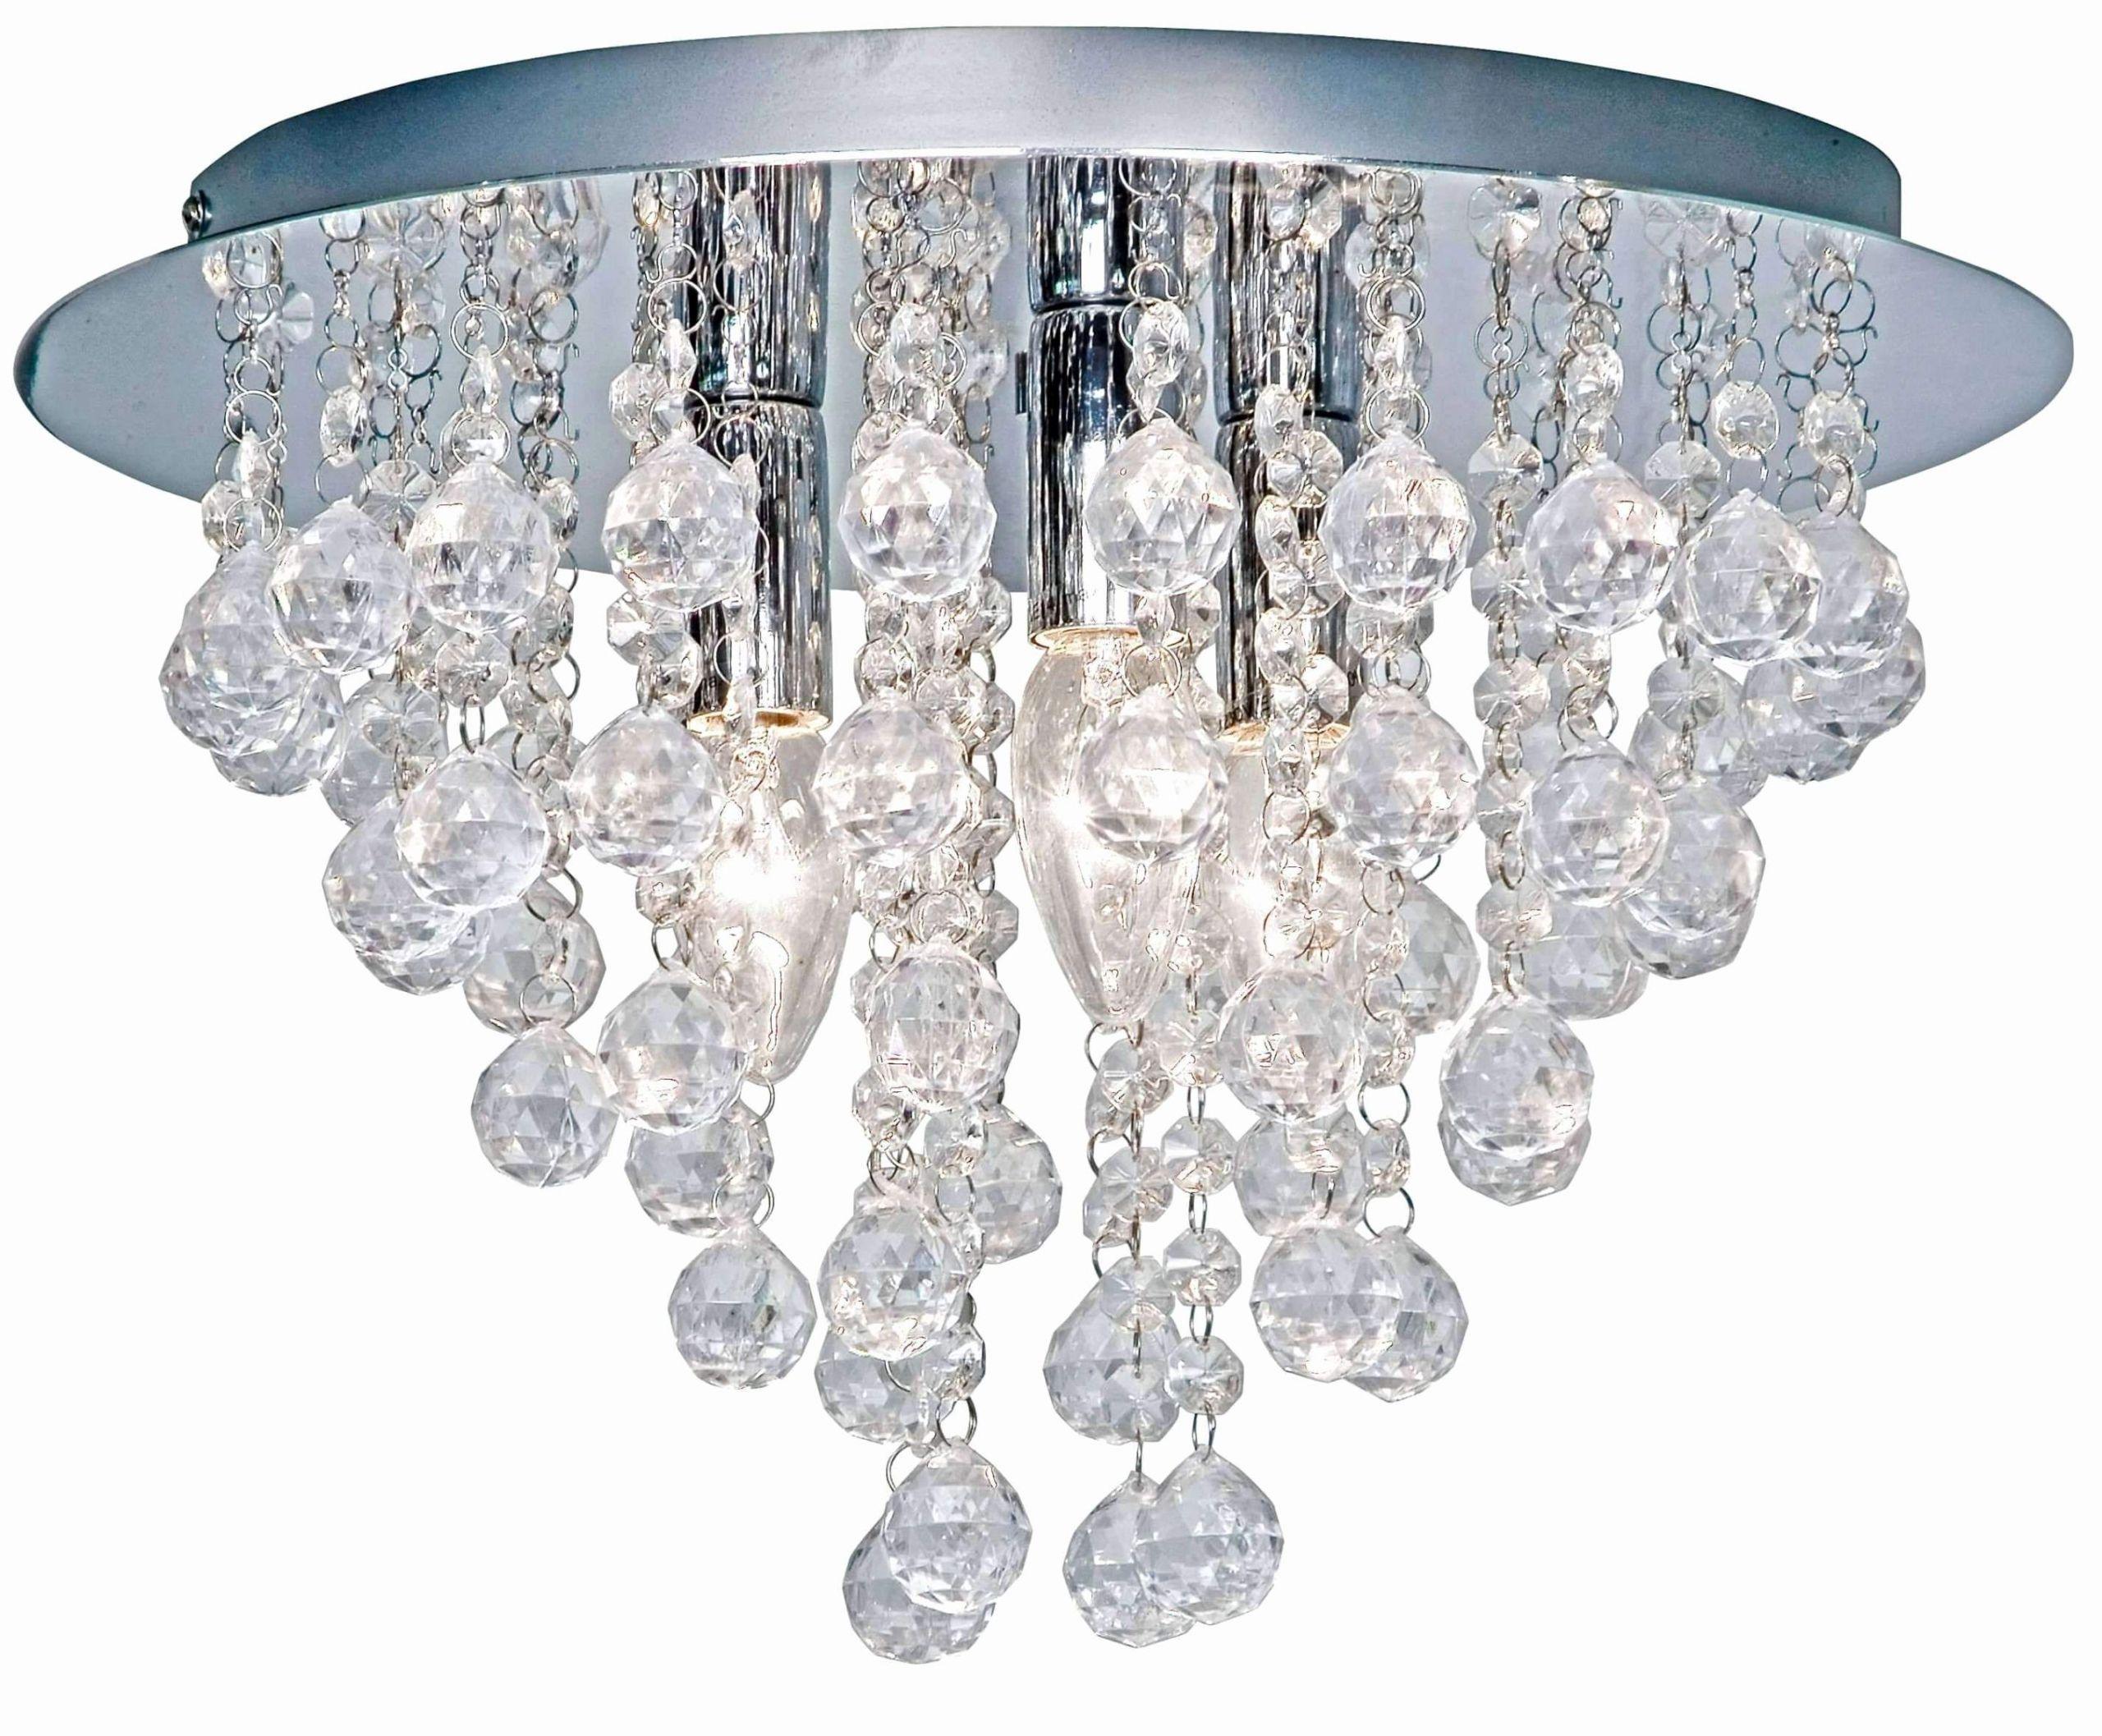 37 Luxus Stehlampe Garten Inspirierend Garten Anlegen